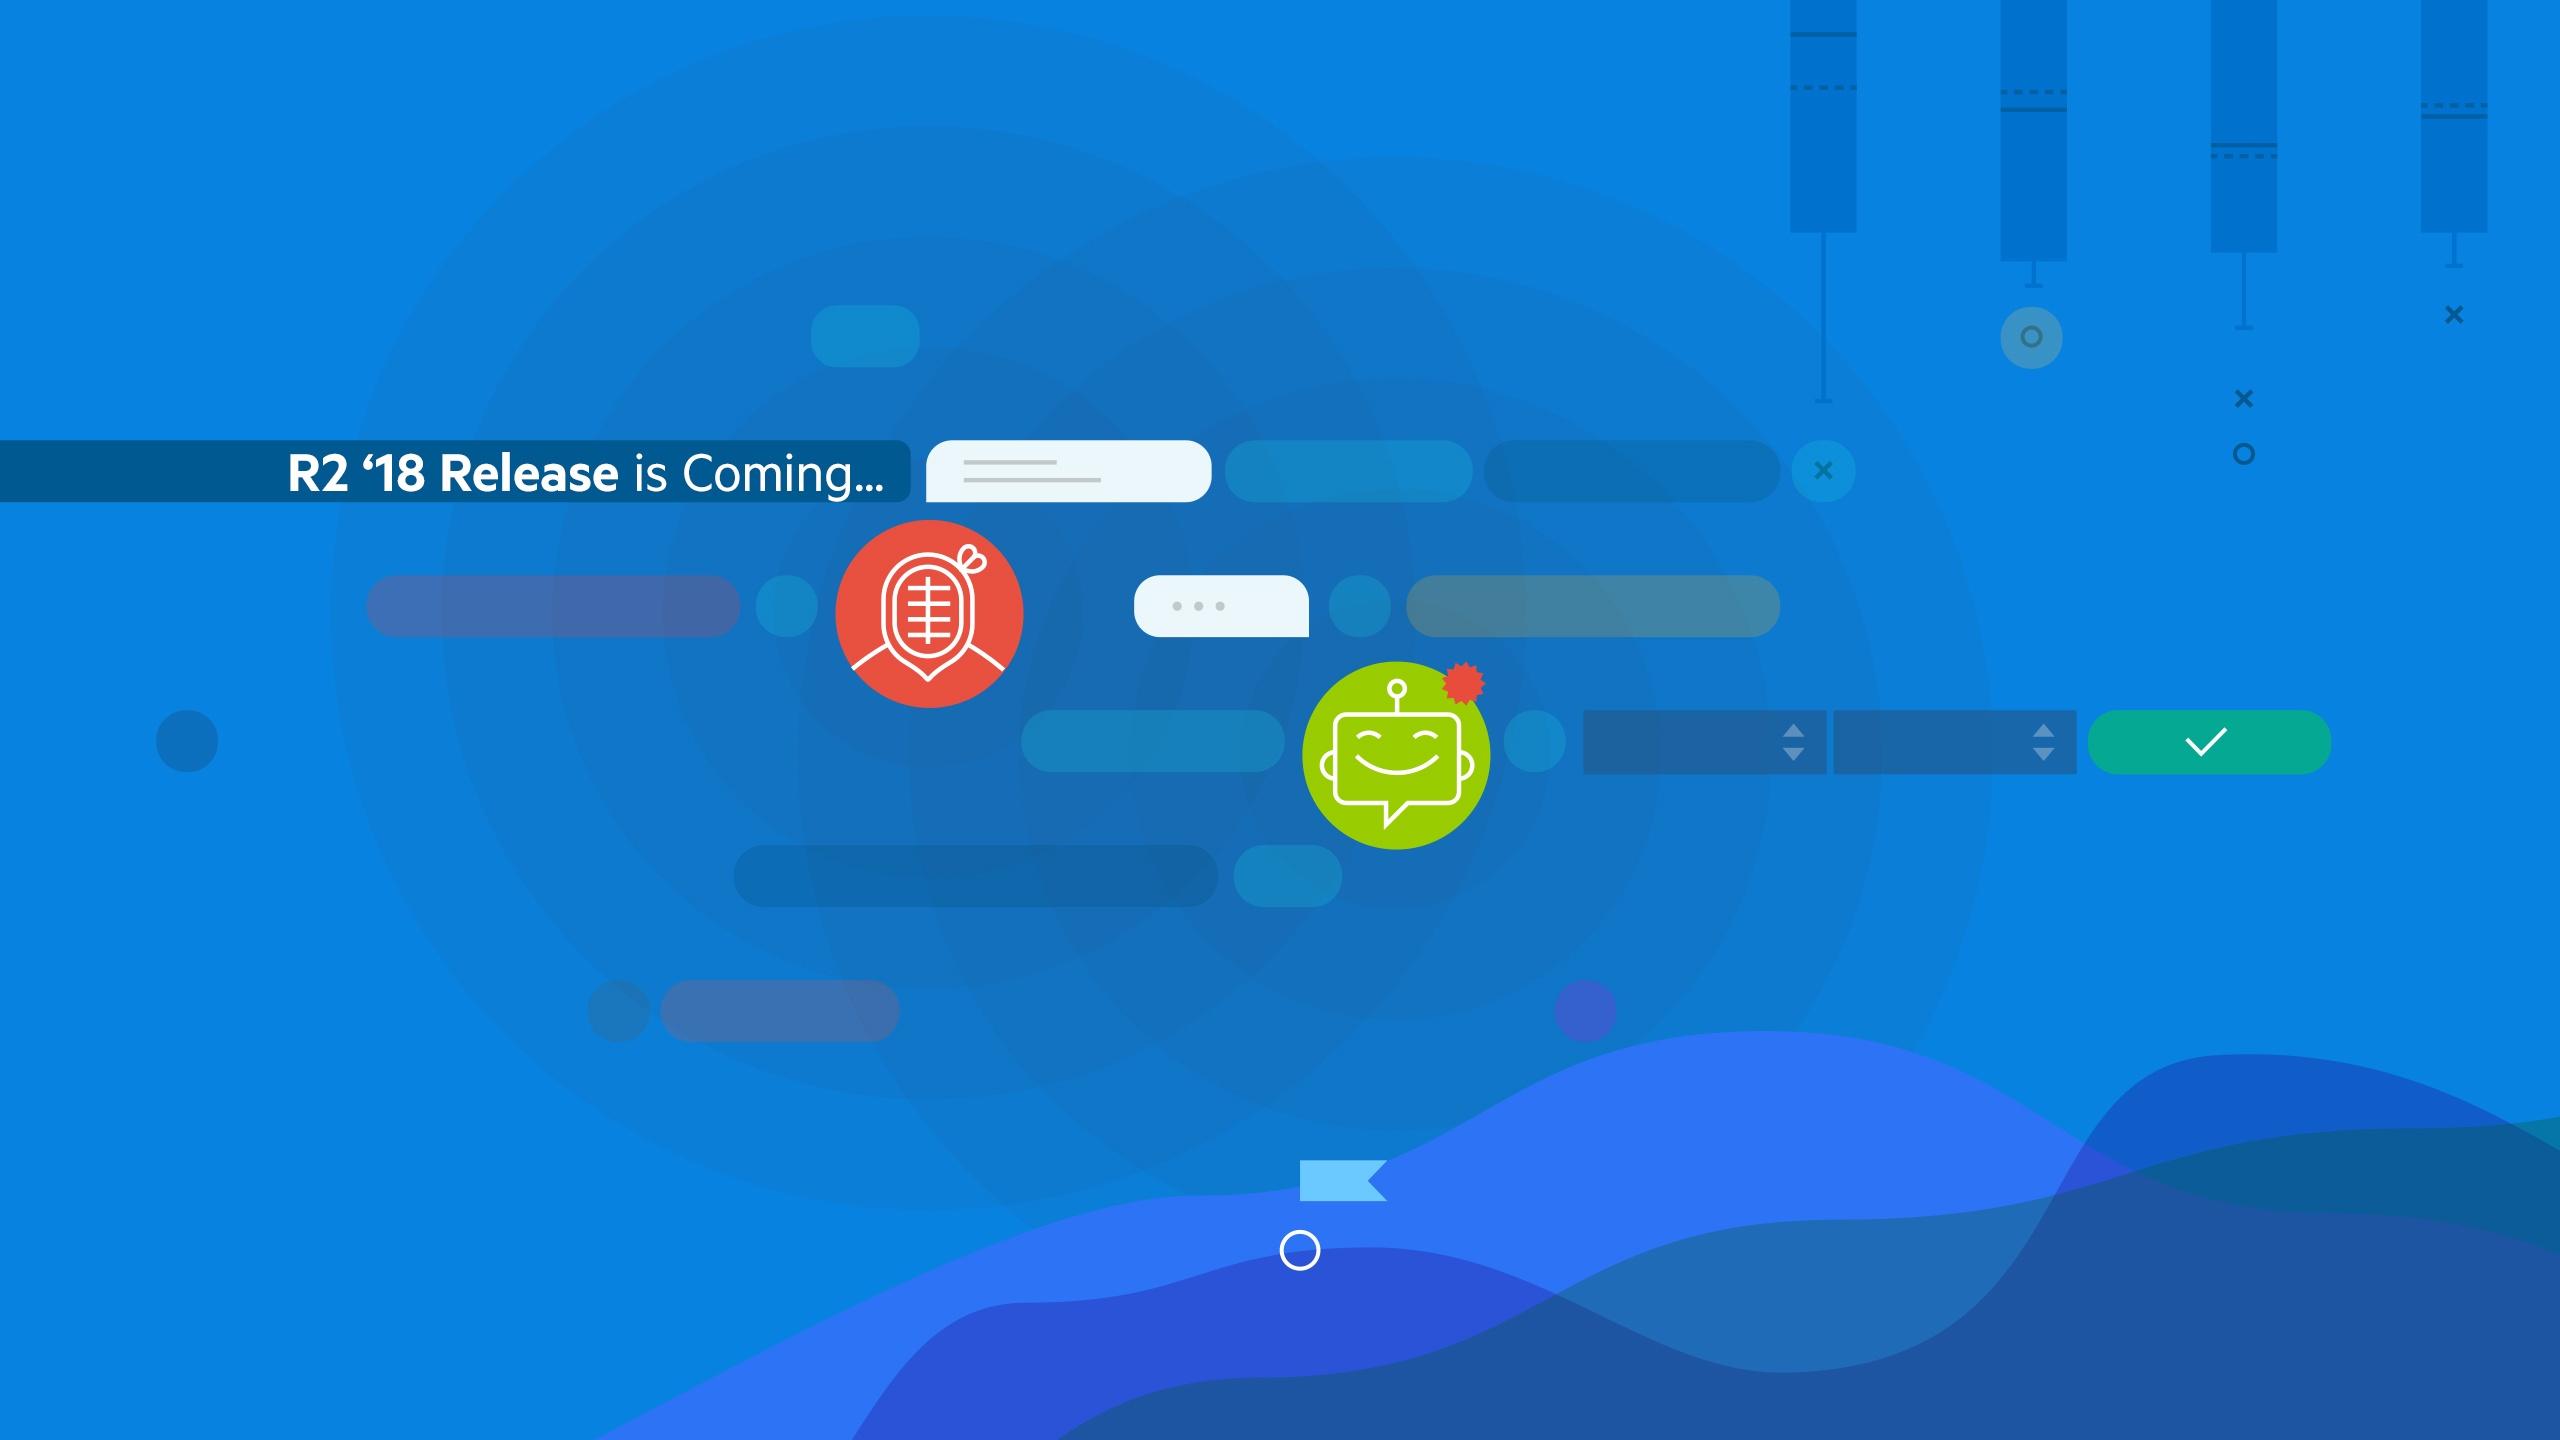 Kendo UI R2 2018 Release Webinar